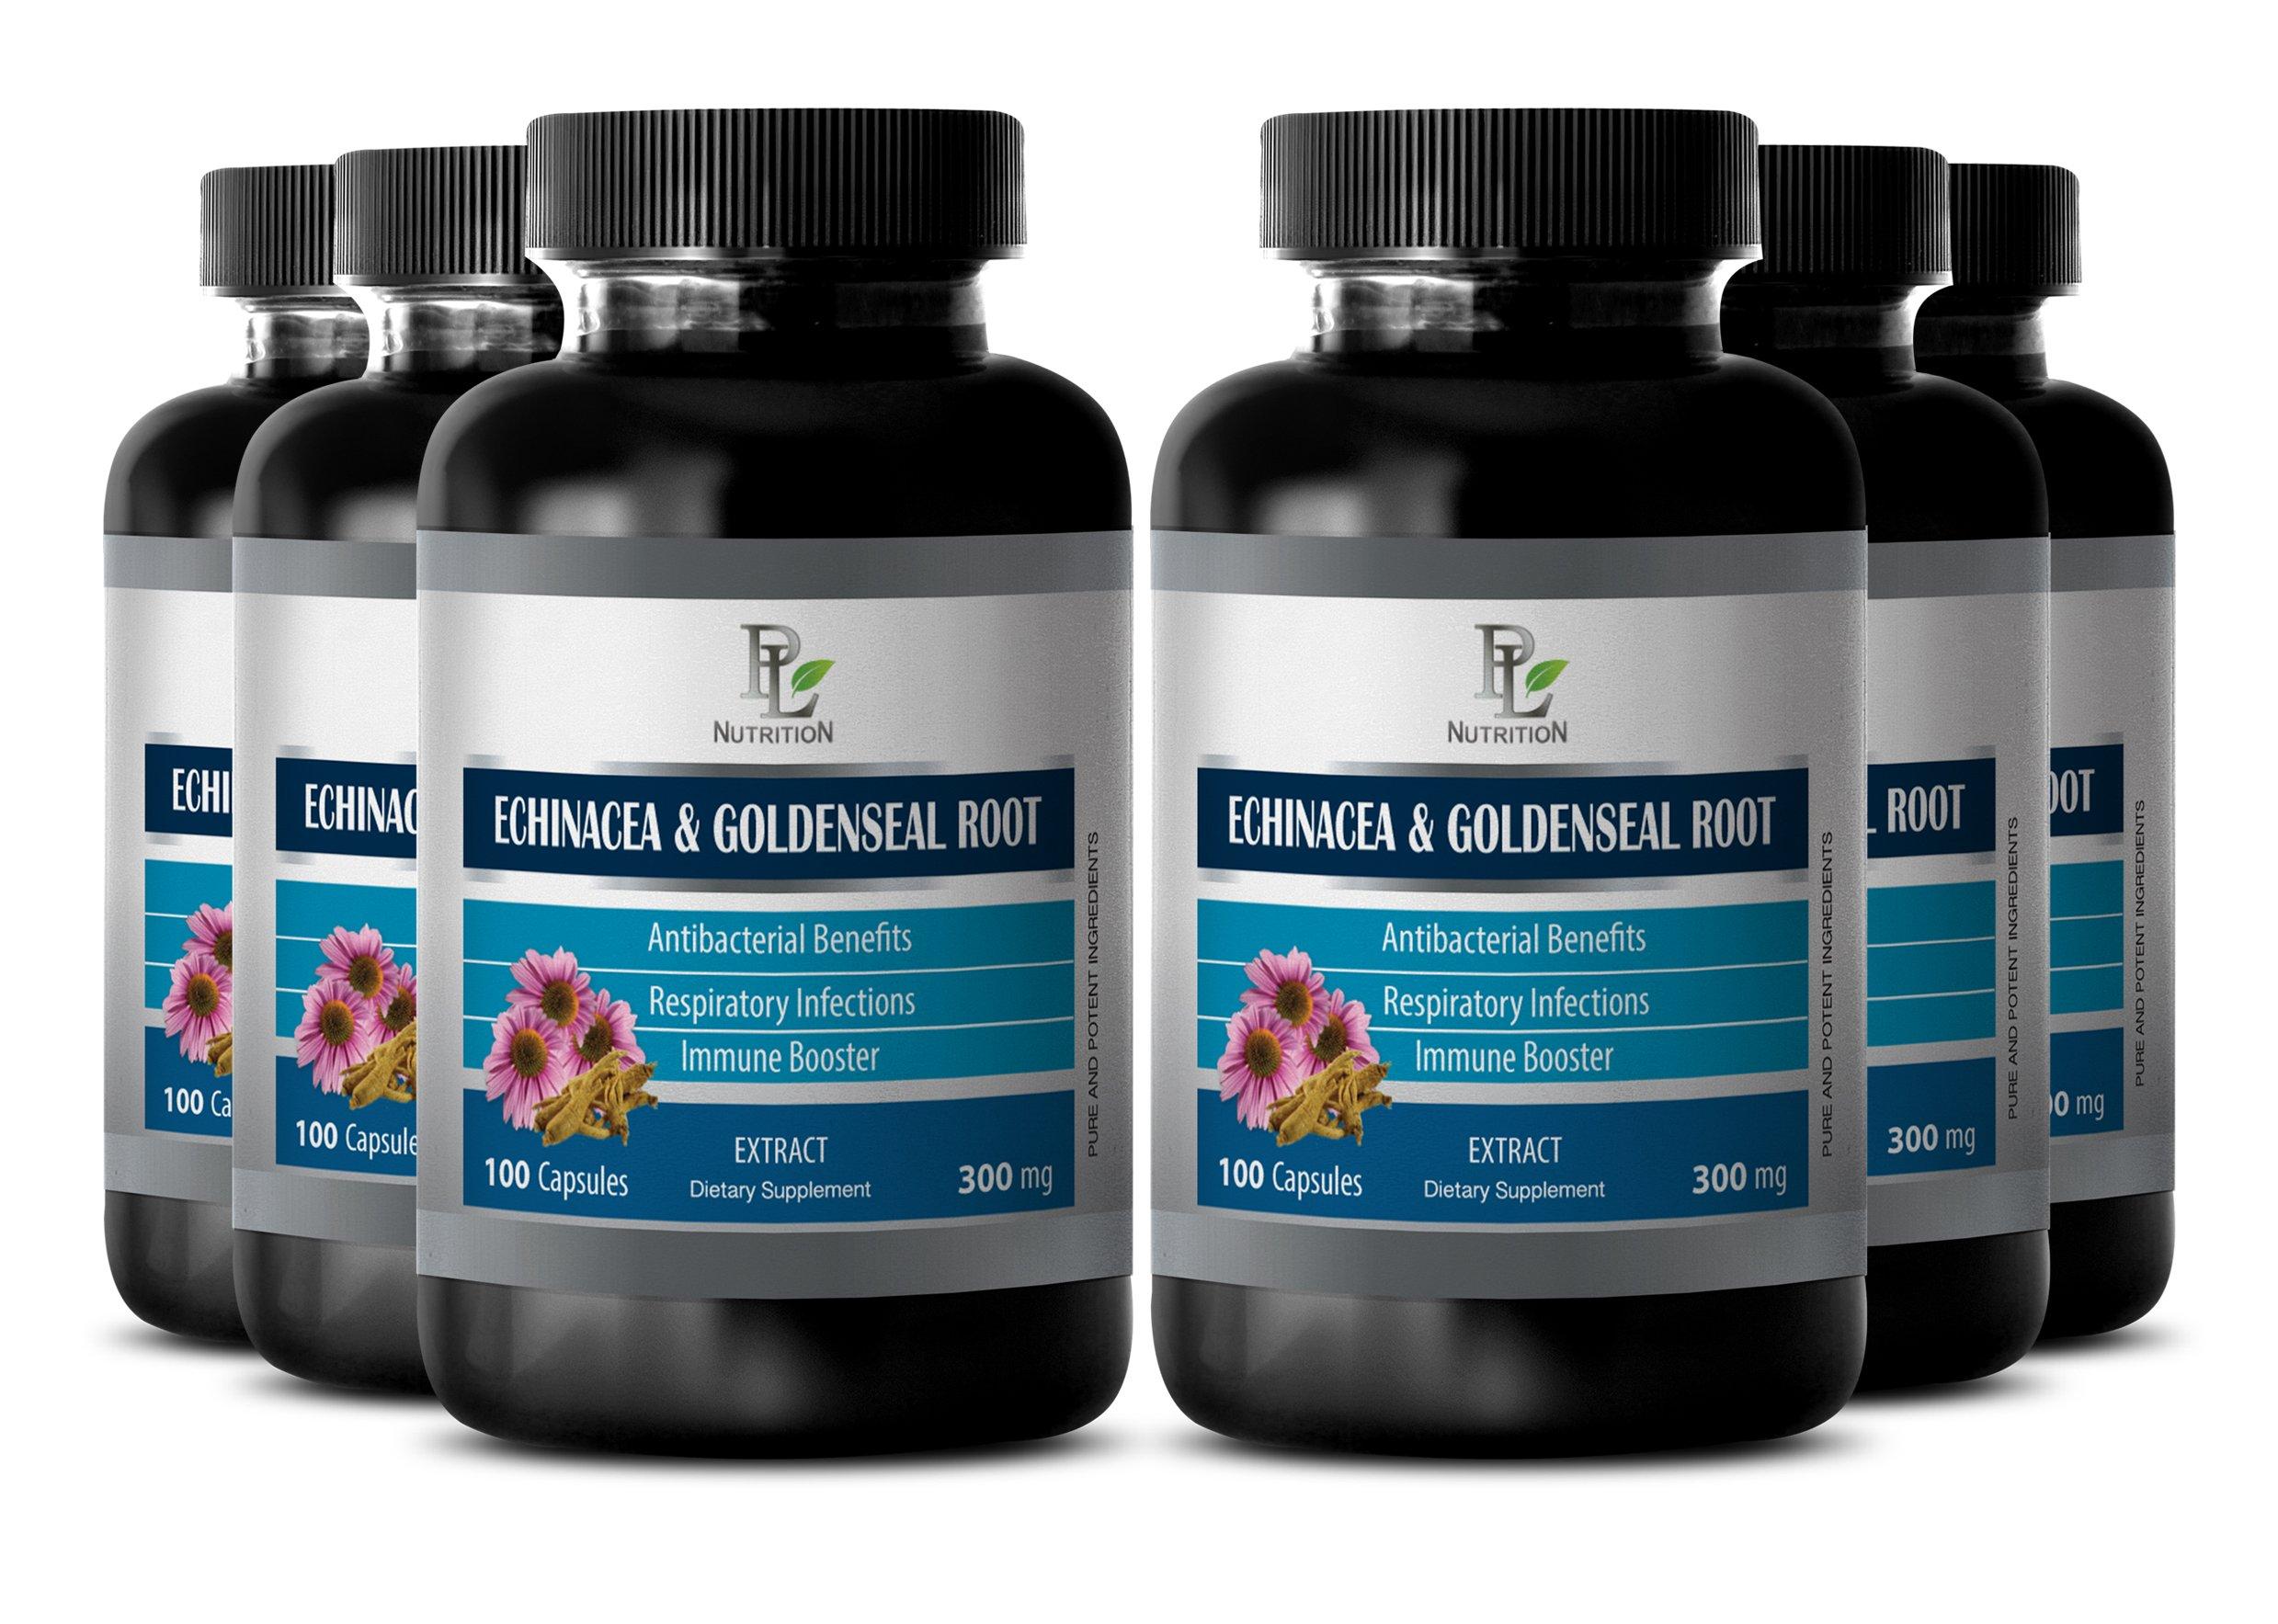 Anti aging - ECHINACEA AND GOLDENSEAL ROOT - Goldenseal detox - 6 Bottles 600 Capsules